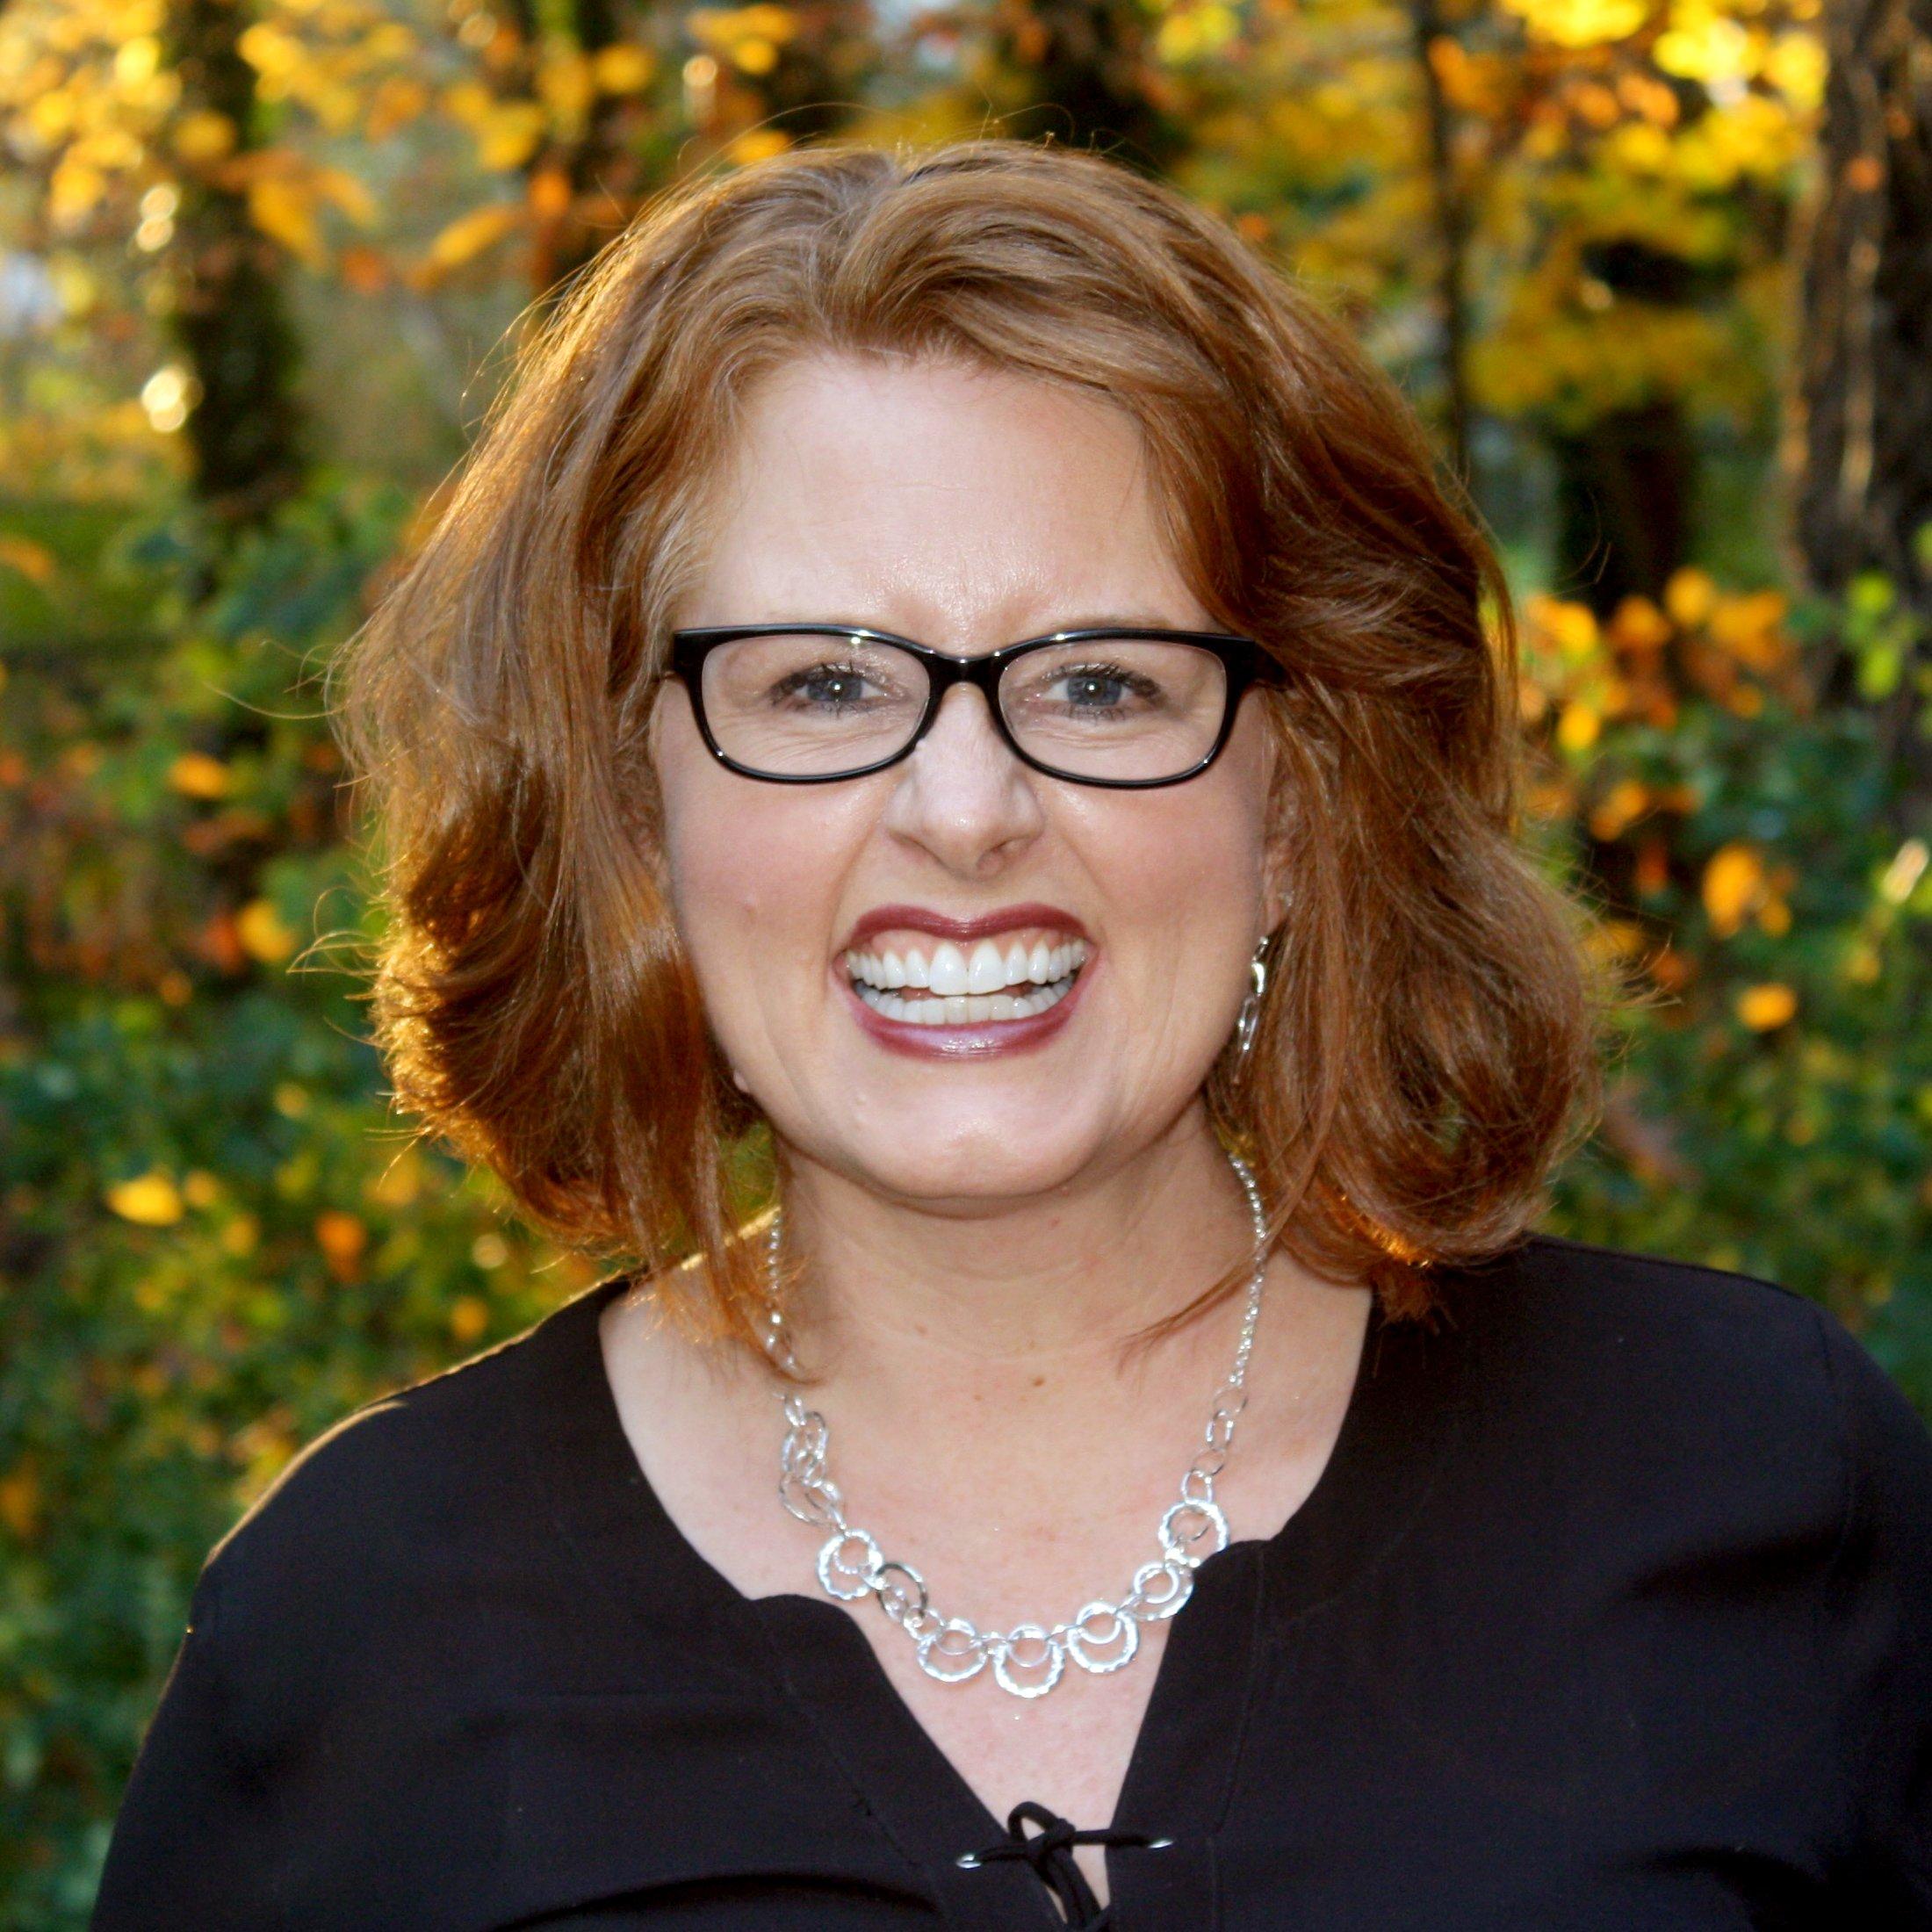 Cindy Bultema Your Spiritual Game Plan